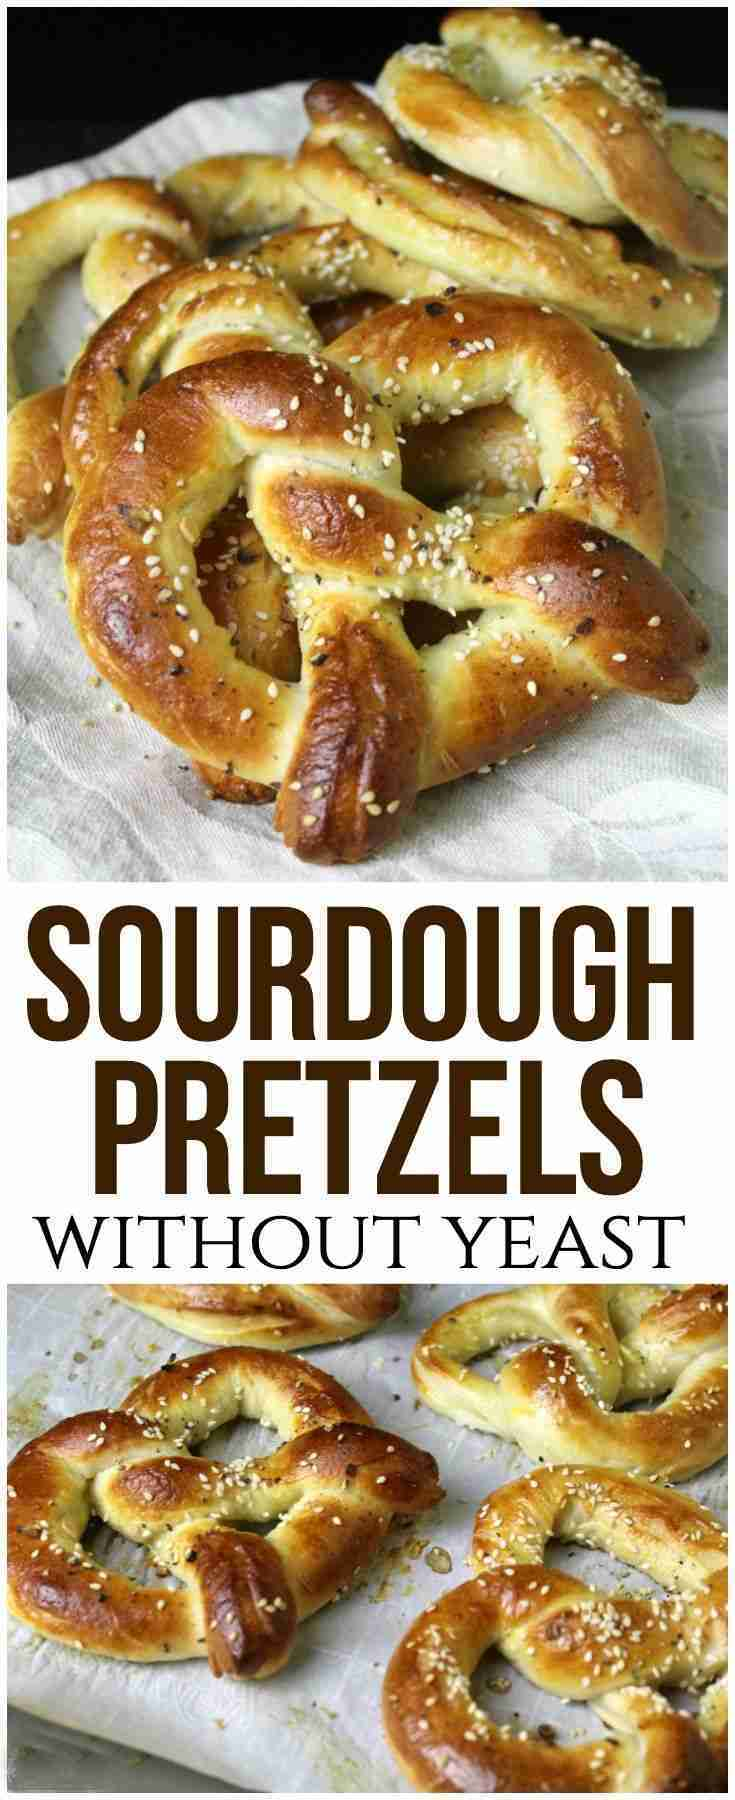 Sourdough Pretzels Recipe (No Yeast!)